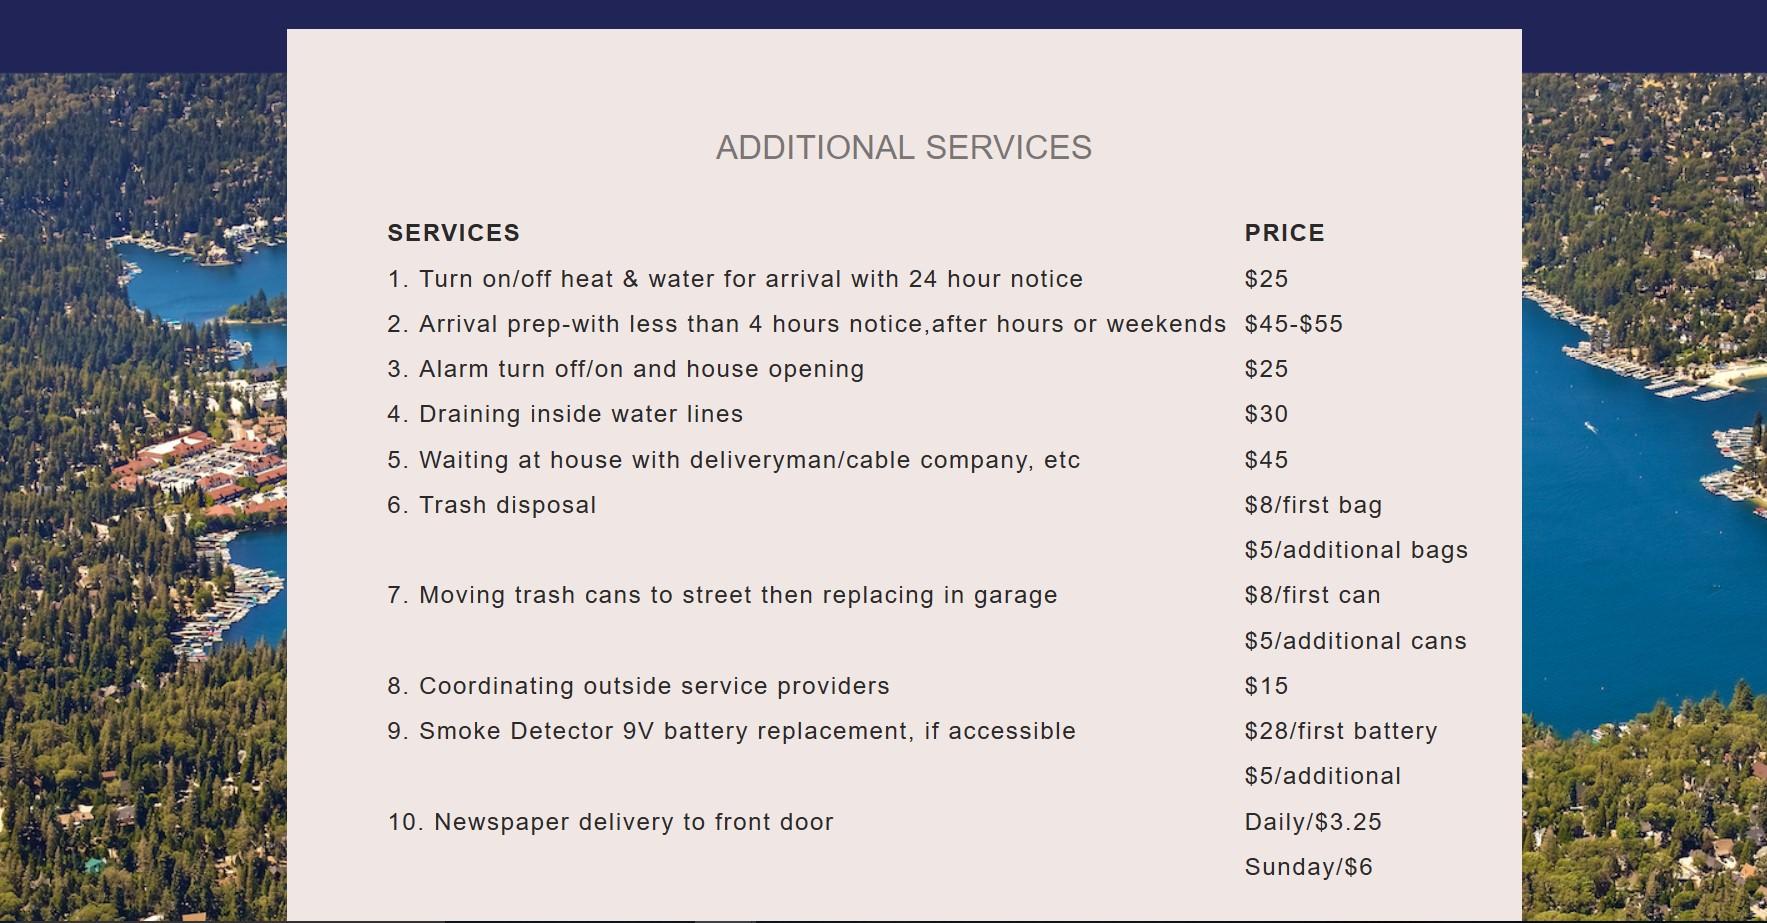 AdditionalServices.jpg